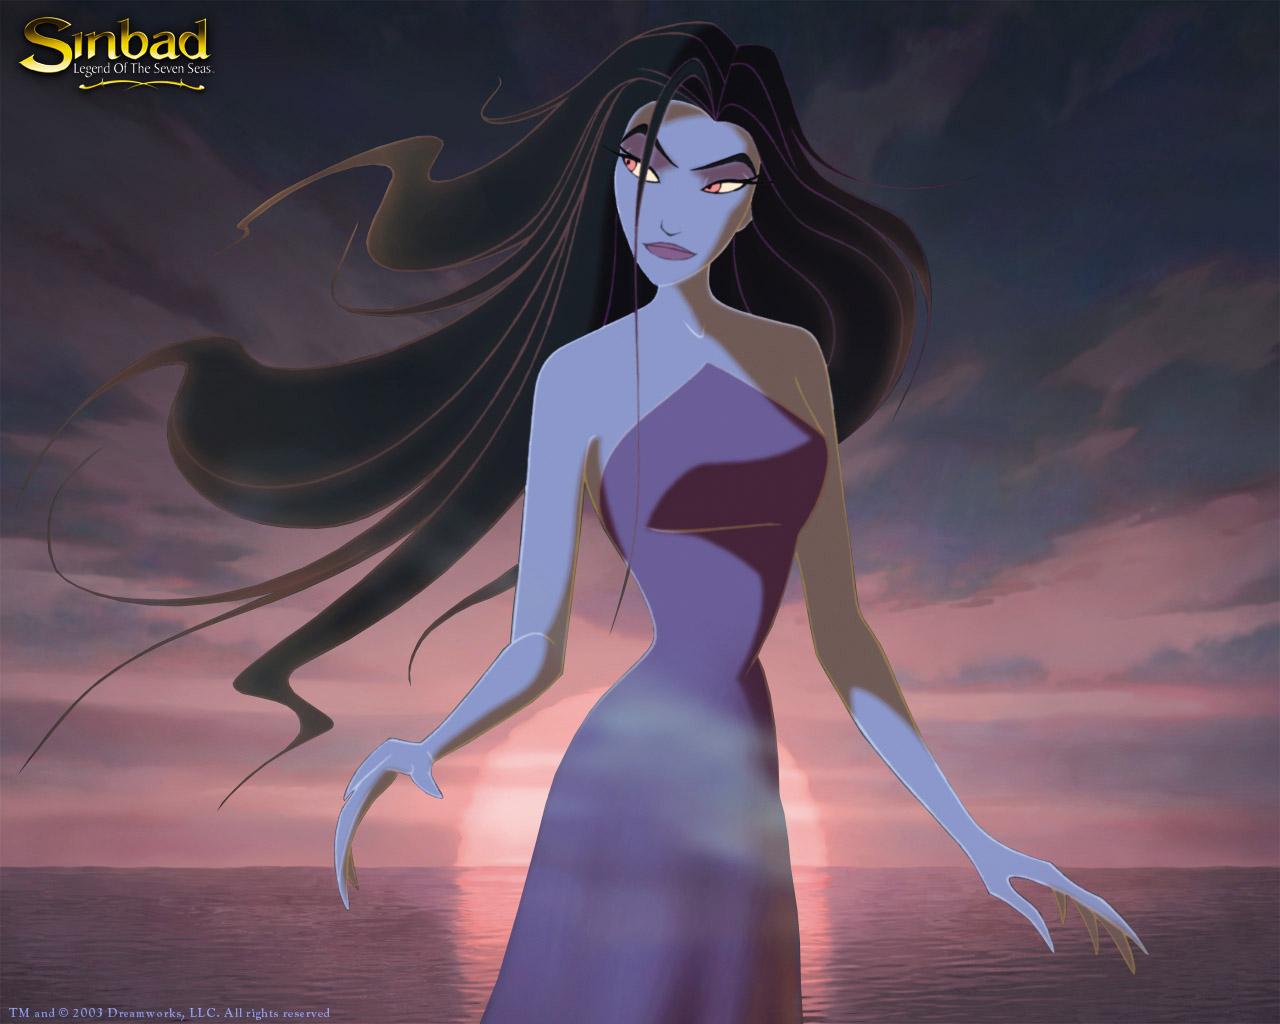 Sinbad legend of the seven seas background wallpaper